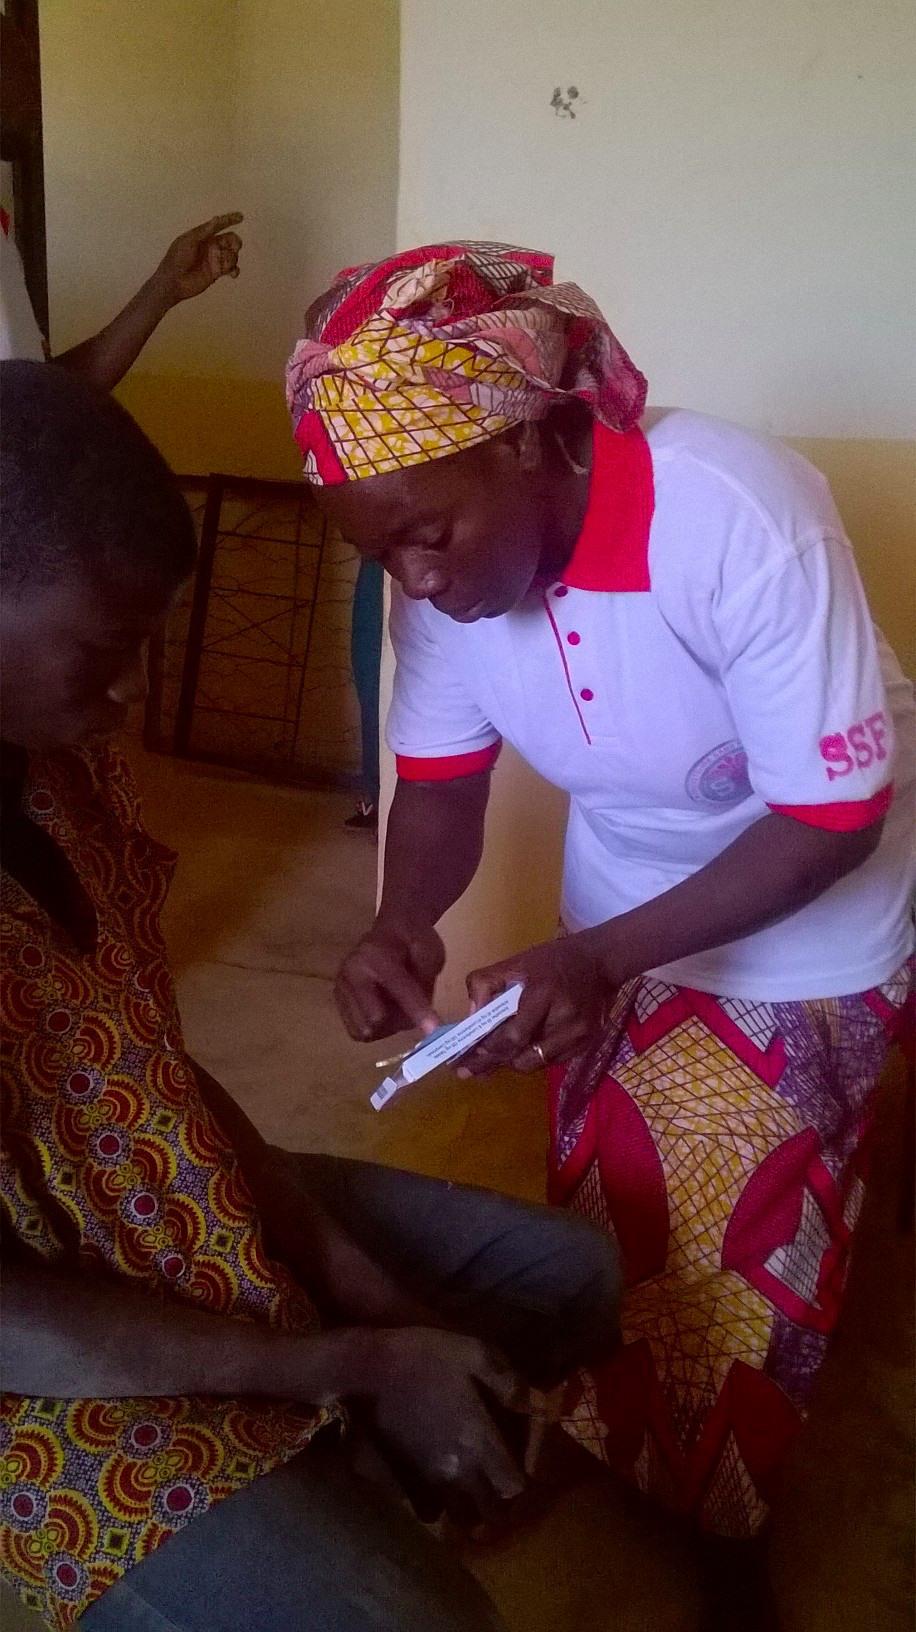 Mission médicale Djekebougou, Mali